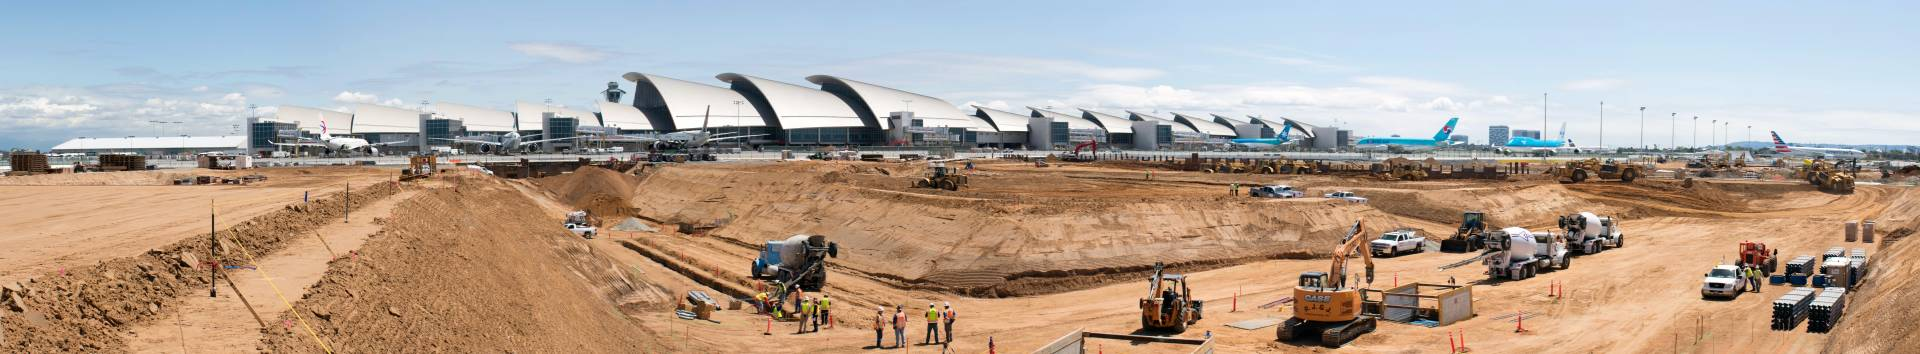 LAX Midfield Satellite Concourse